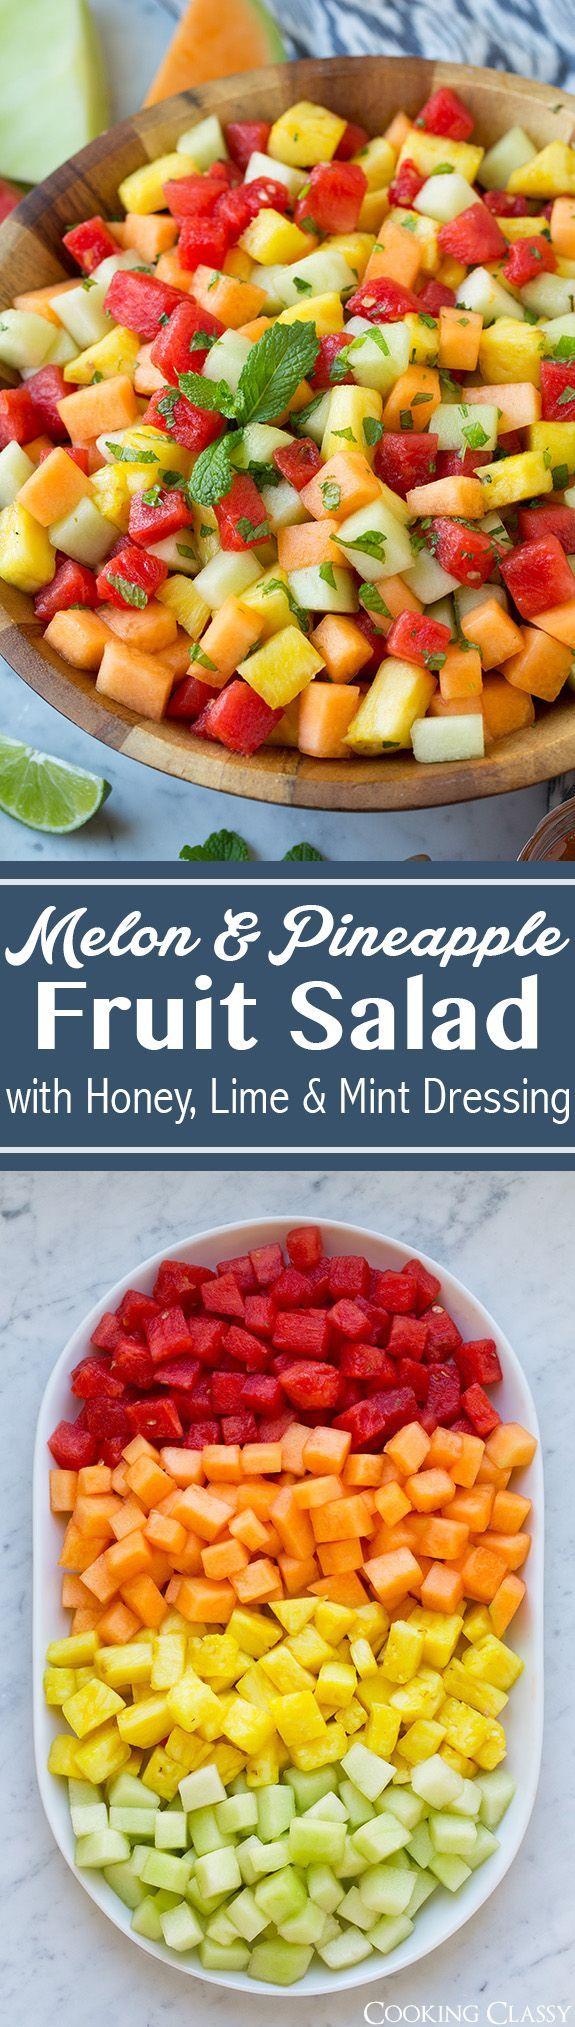 Spring Recipe Ideas   Melon Fruit Salad - the perfect spring and summer fruit salad! Light and perfectly refreshing!